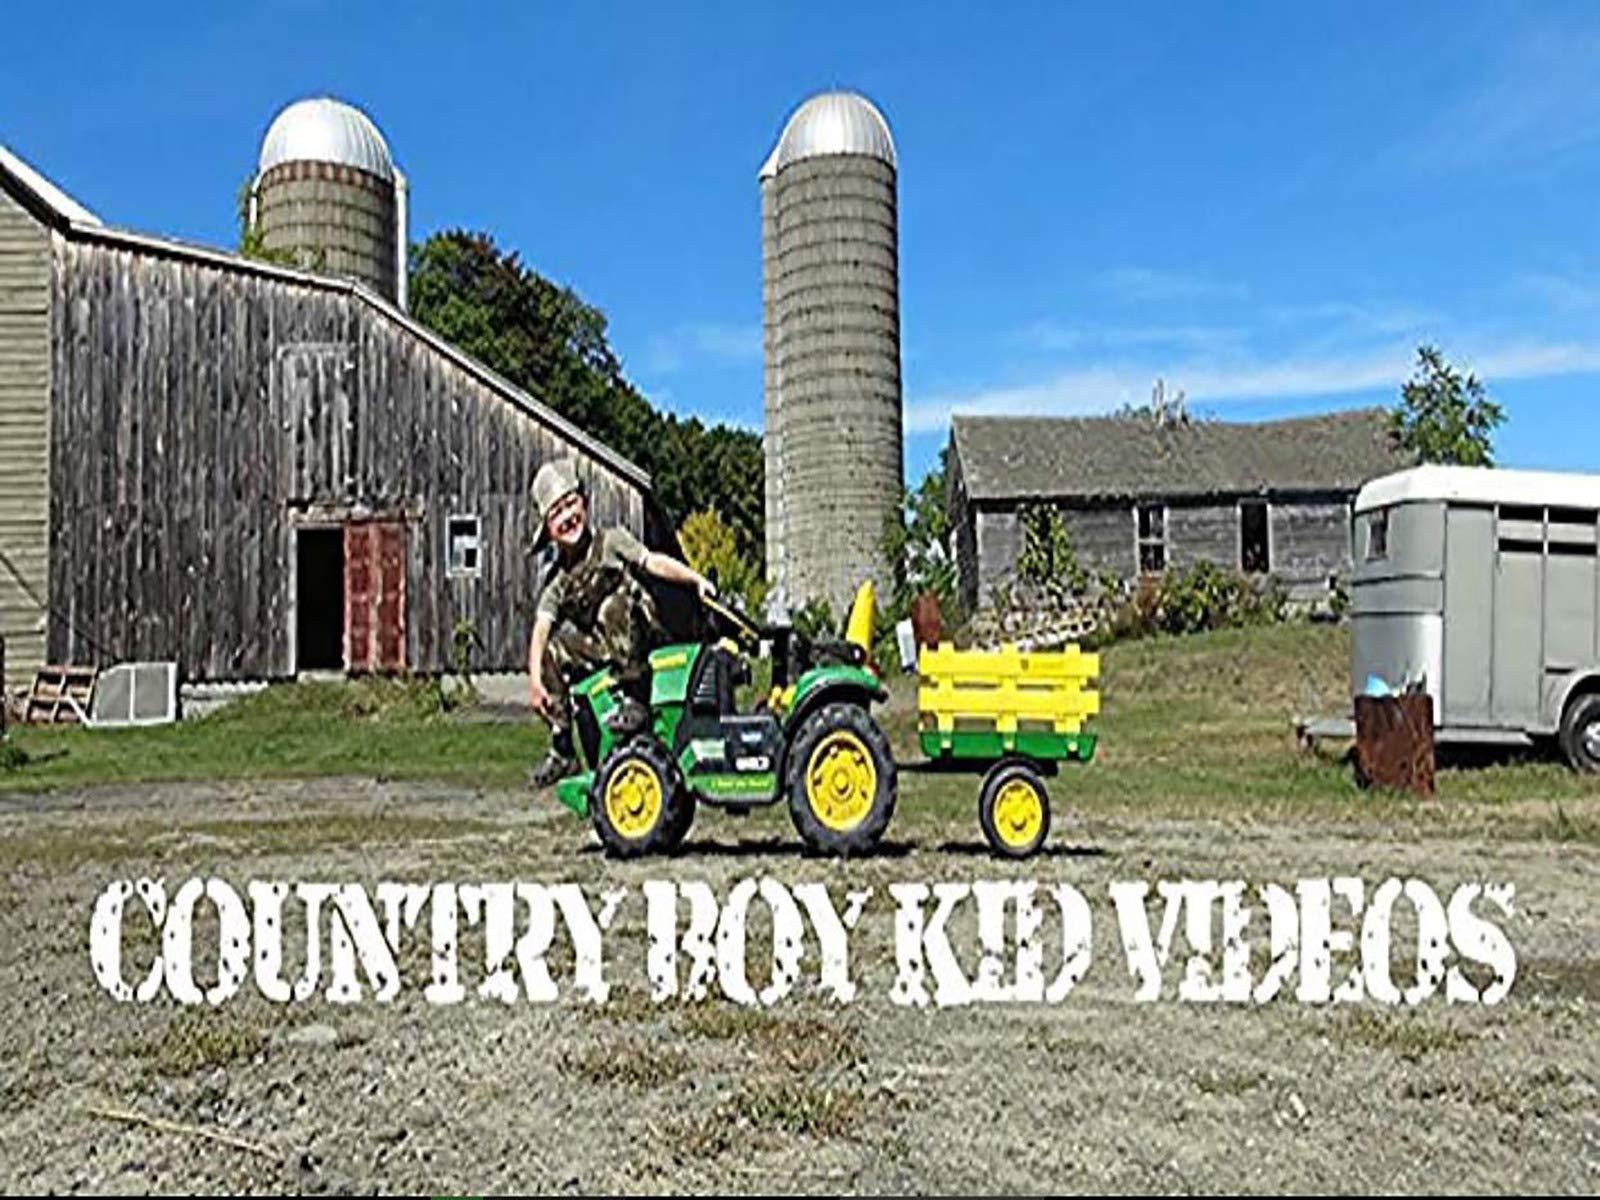 Country Boy Kid Videos on Amazon Prime Video UK